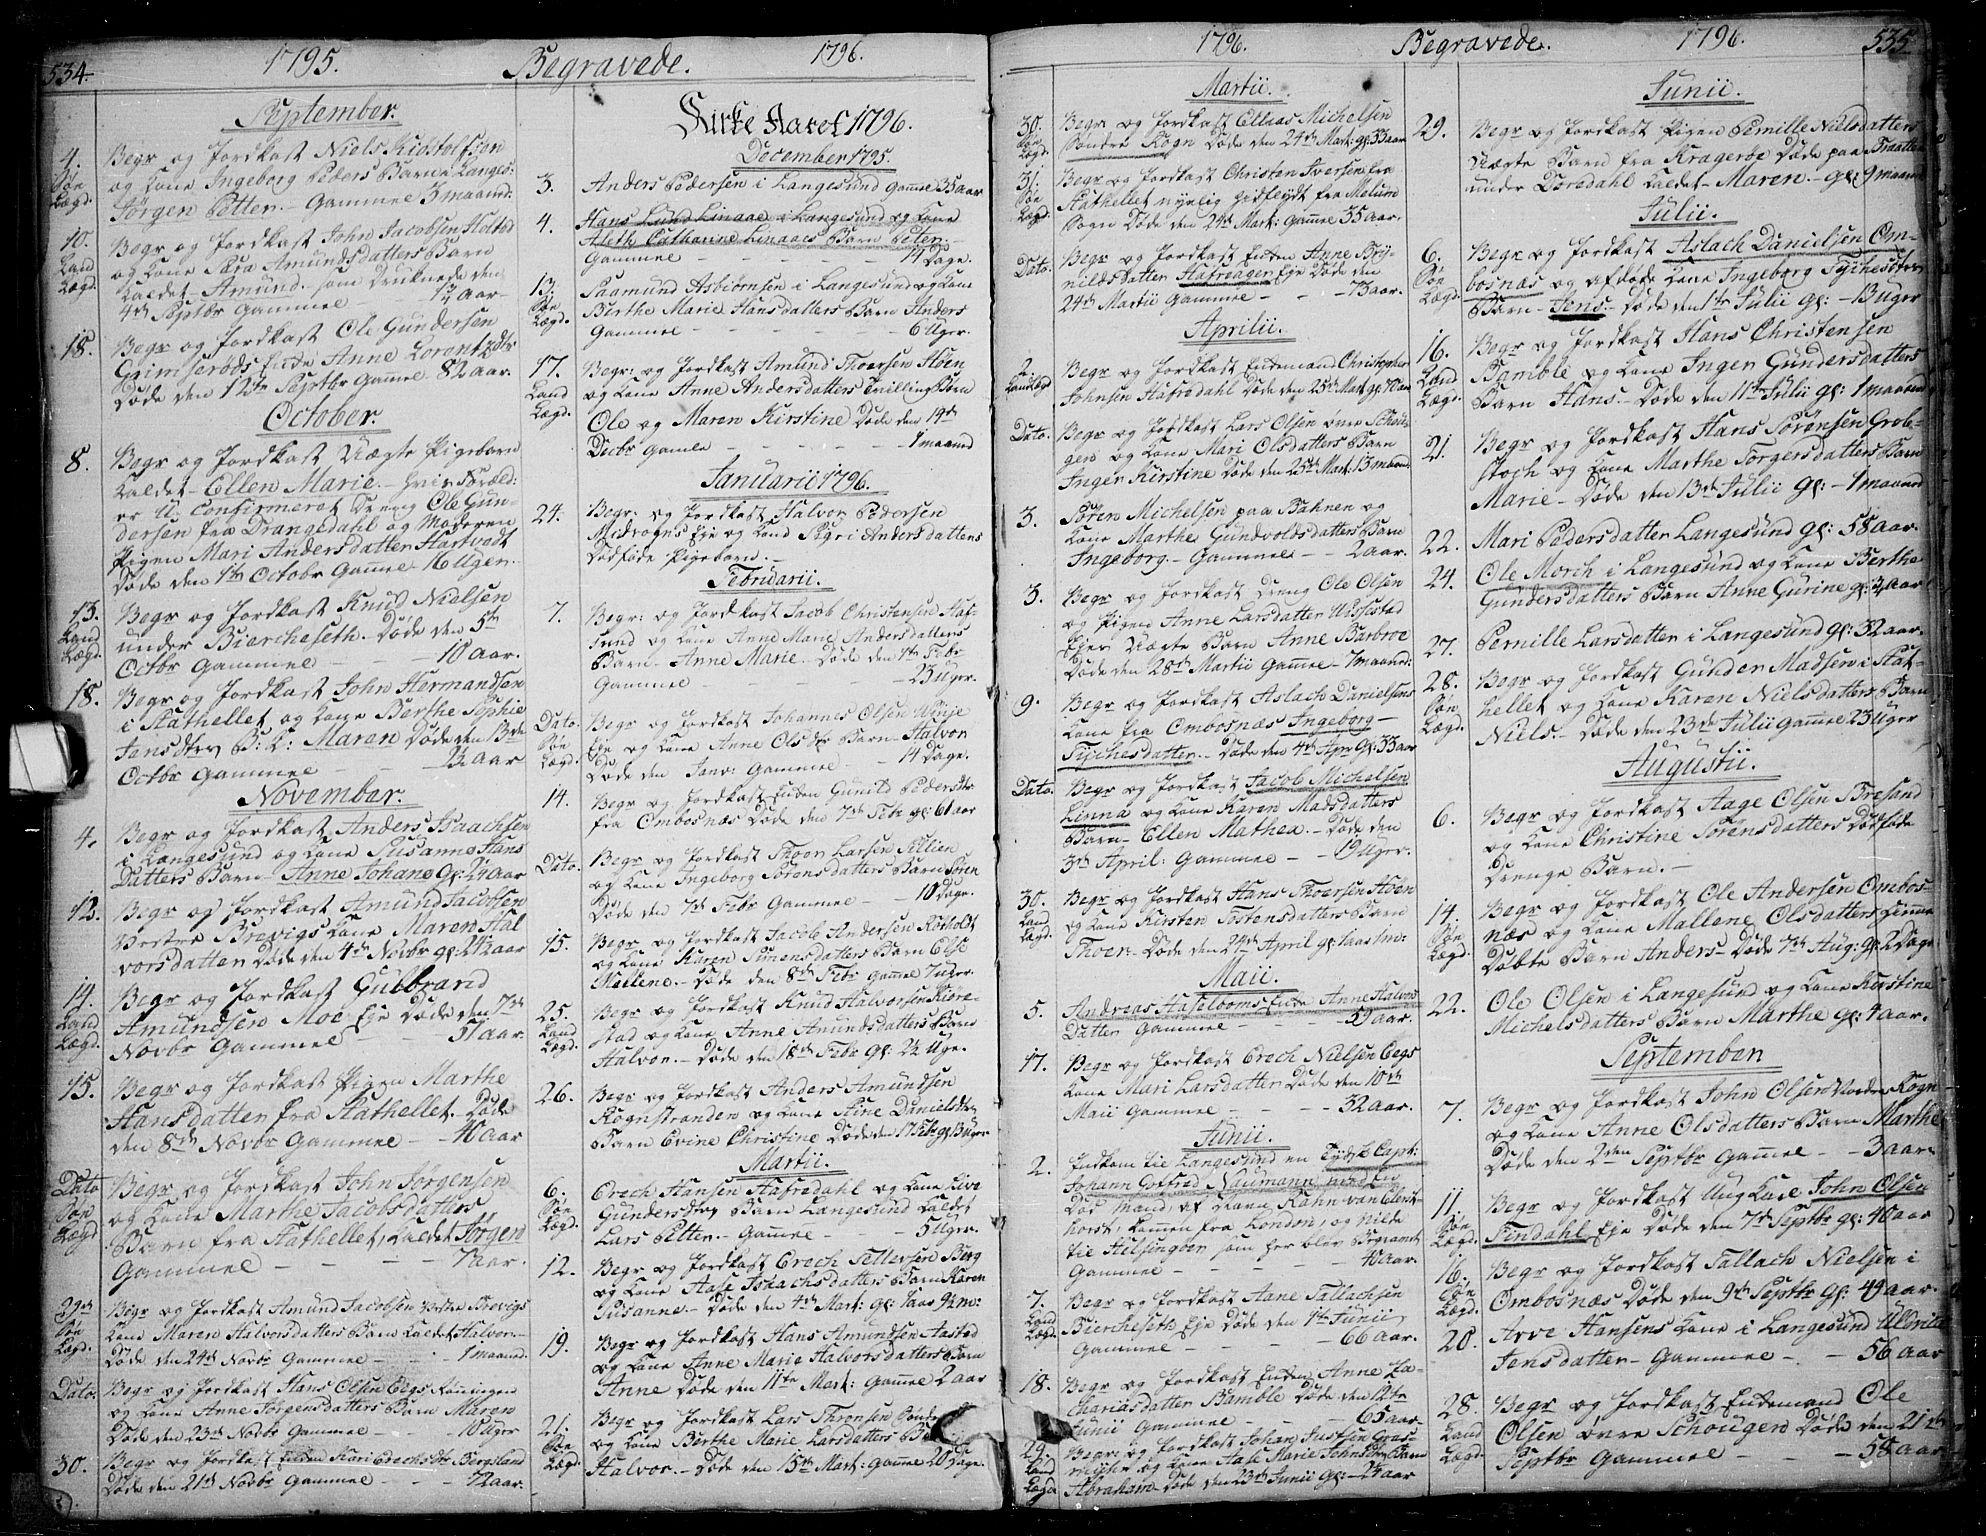 SAKO, Bamble kirkebøker, F/Fa/L0002: Ministerialbok nr. I 2, 1775-1814, s. 534-535